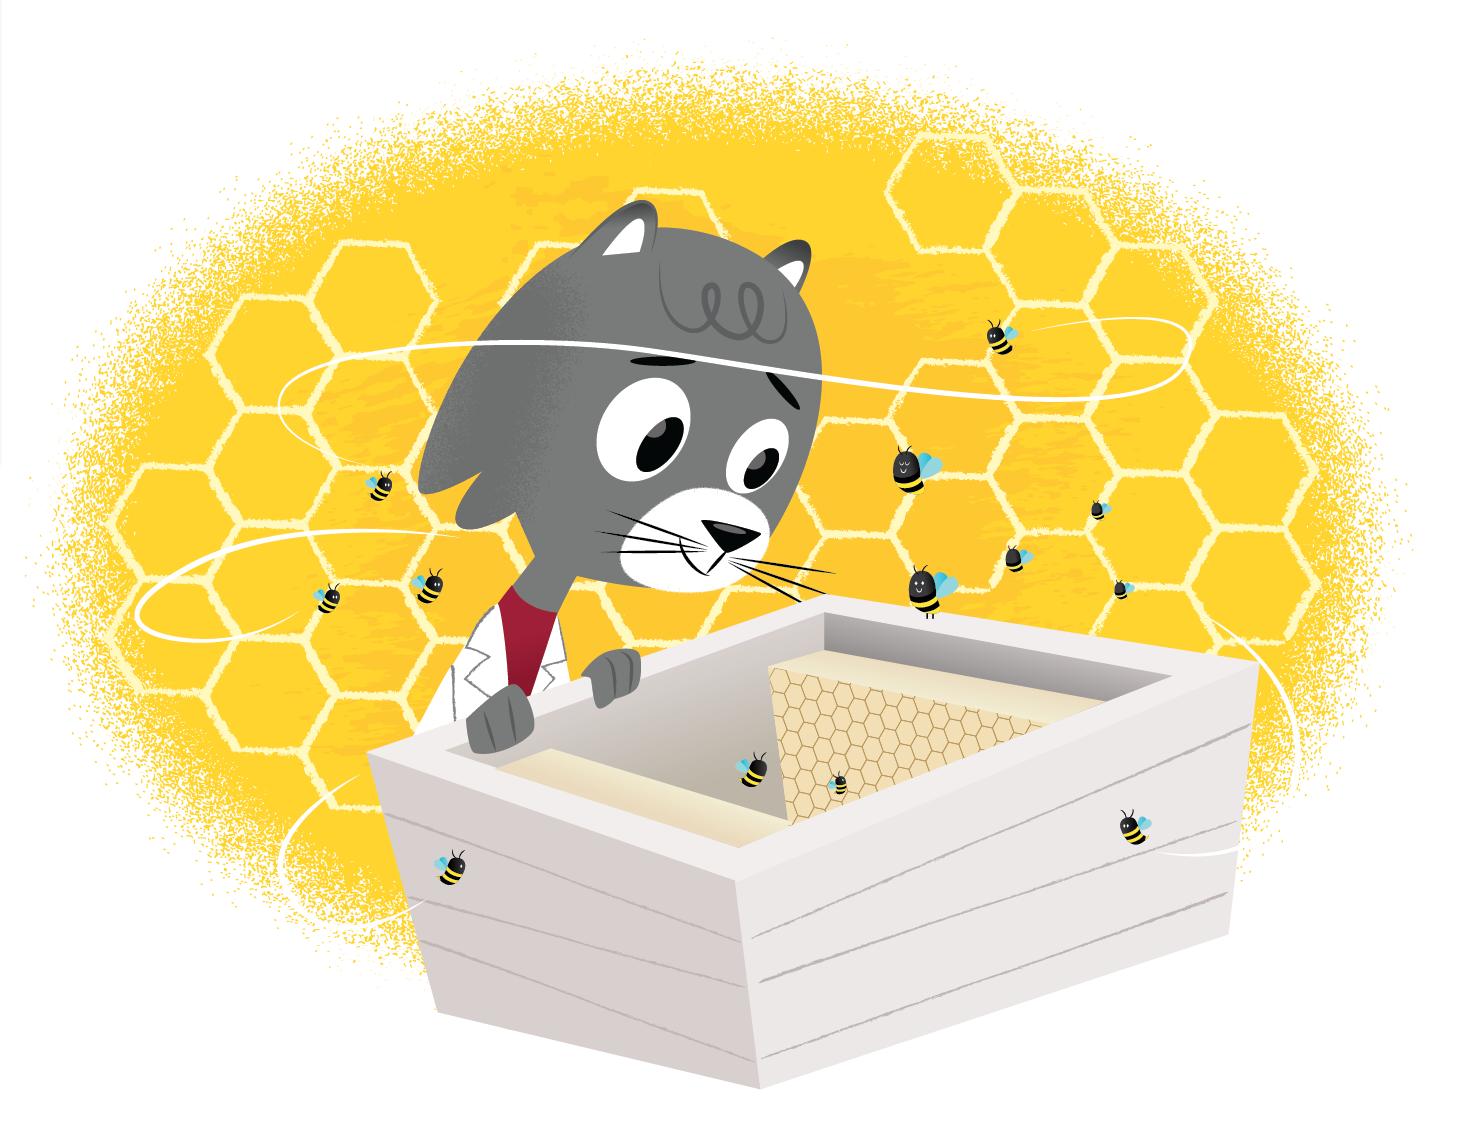 Cat cartoon of Dr. Universe, grey cat with lab coat, examining a box of cartoon bees.